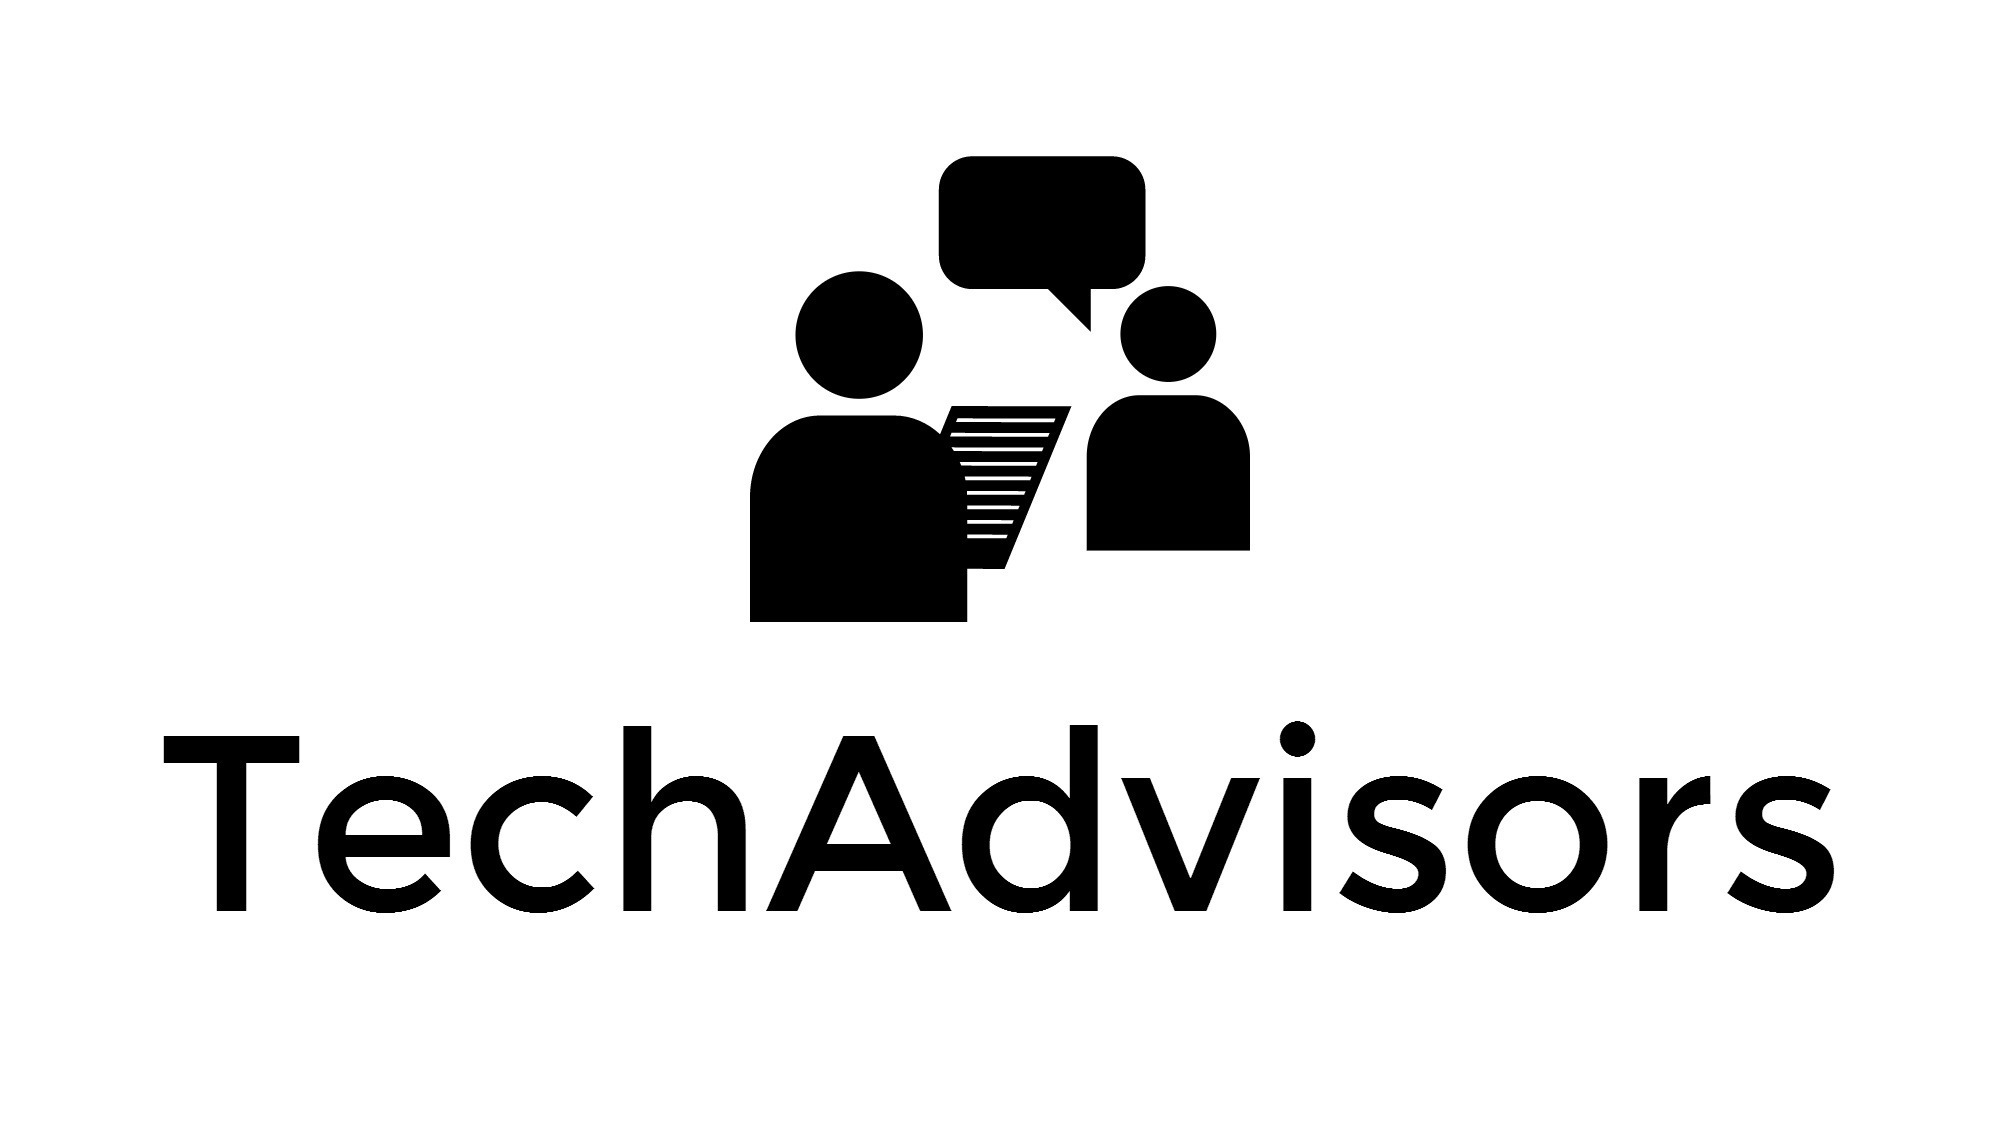 TechAdvisors